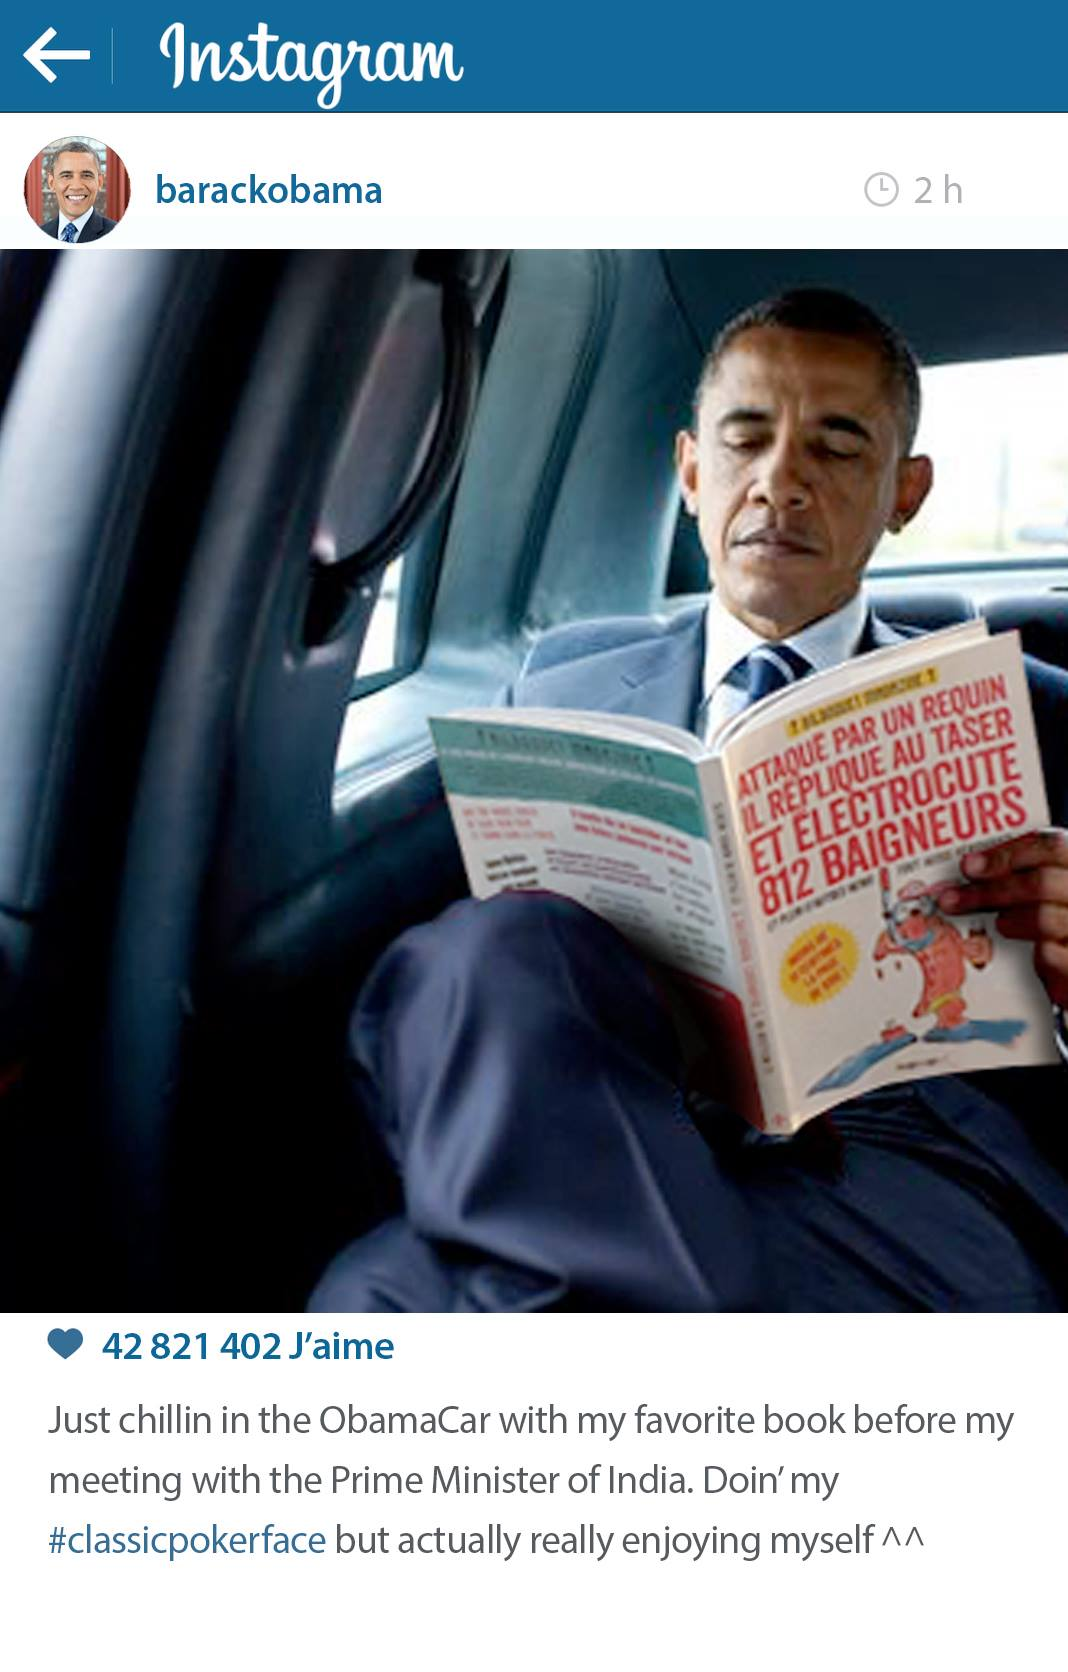 Bilboquet Magazine   Le Vrai William Charrier Derri U00e8re Les